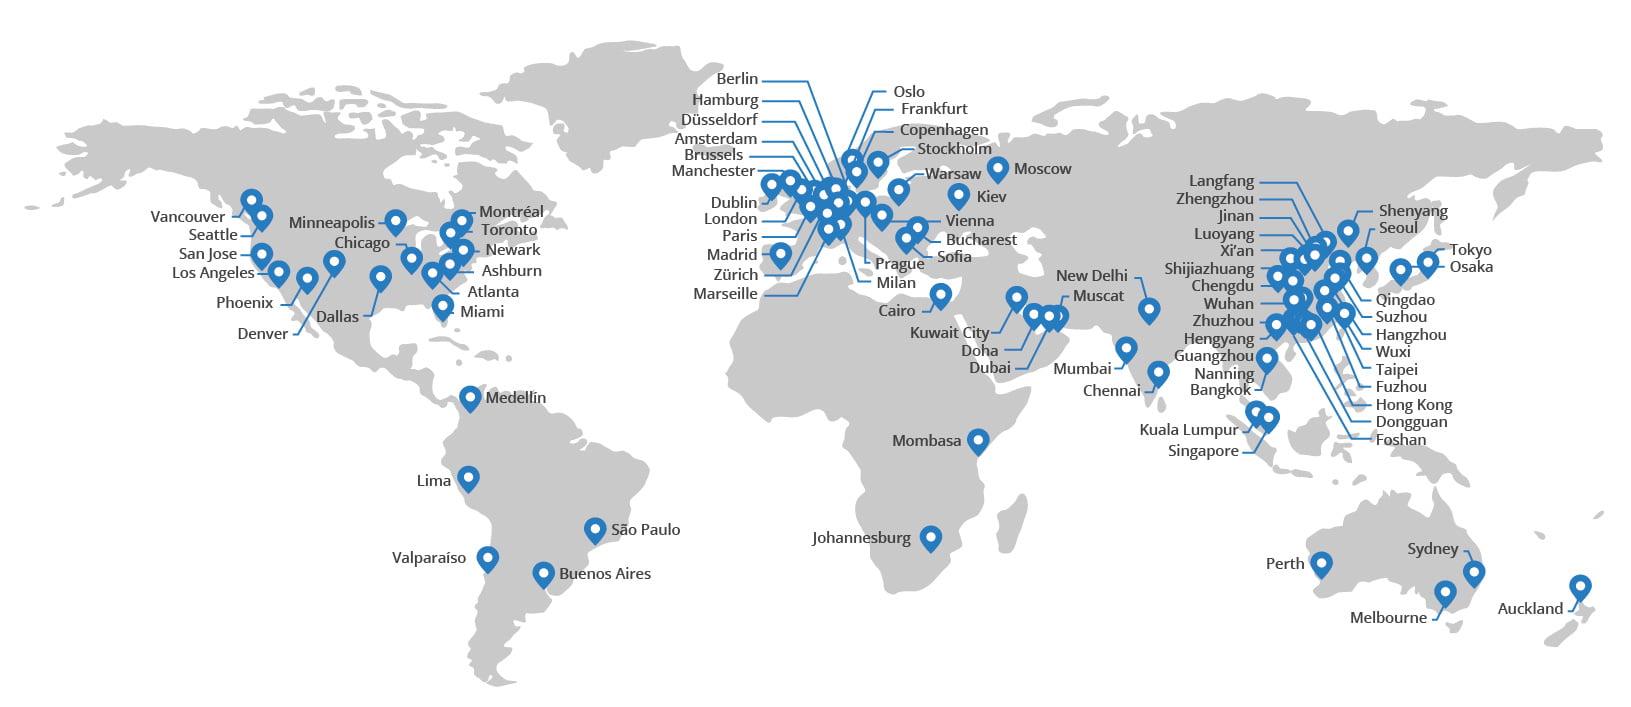 CDN maps